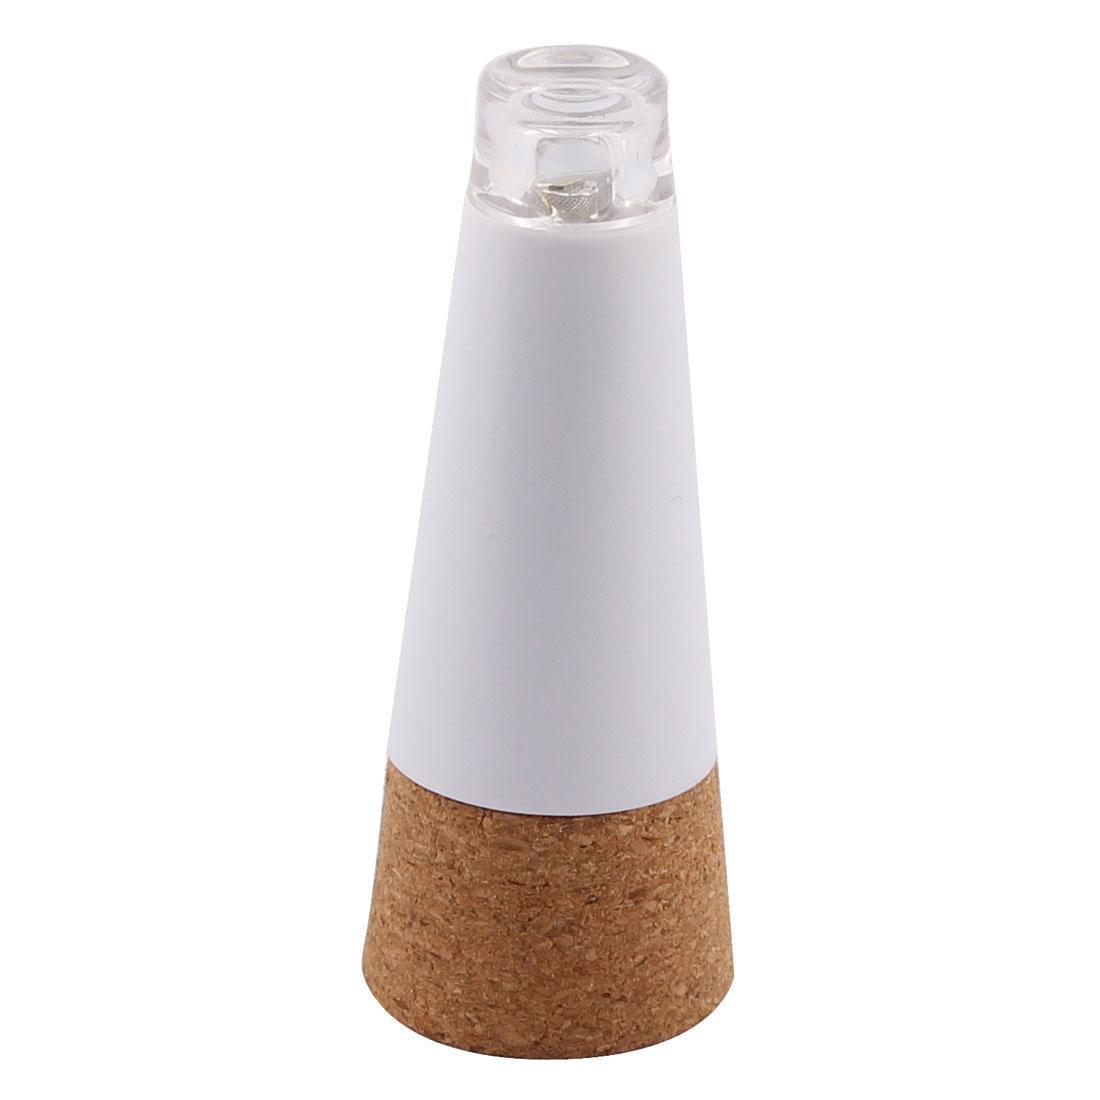 Cork Shaped 7 Colors USB LED Lamp Stopper Decor Empty Wine Bottle Light